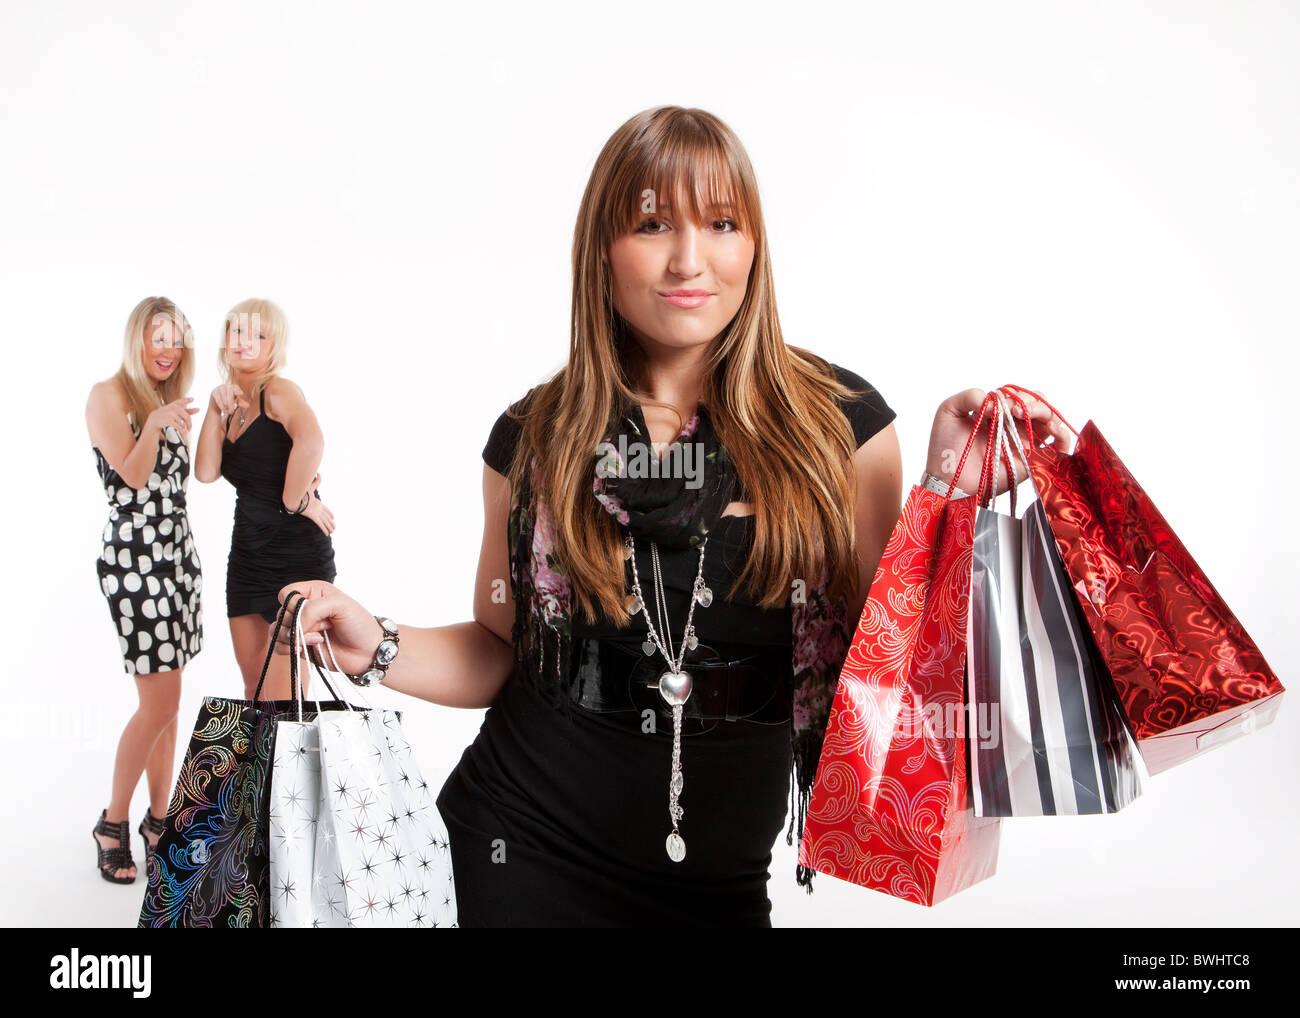 589cc960a4e2 Envy Girls Stock Photos   Envy Girls Stock Images - Alamy